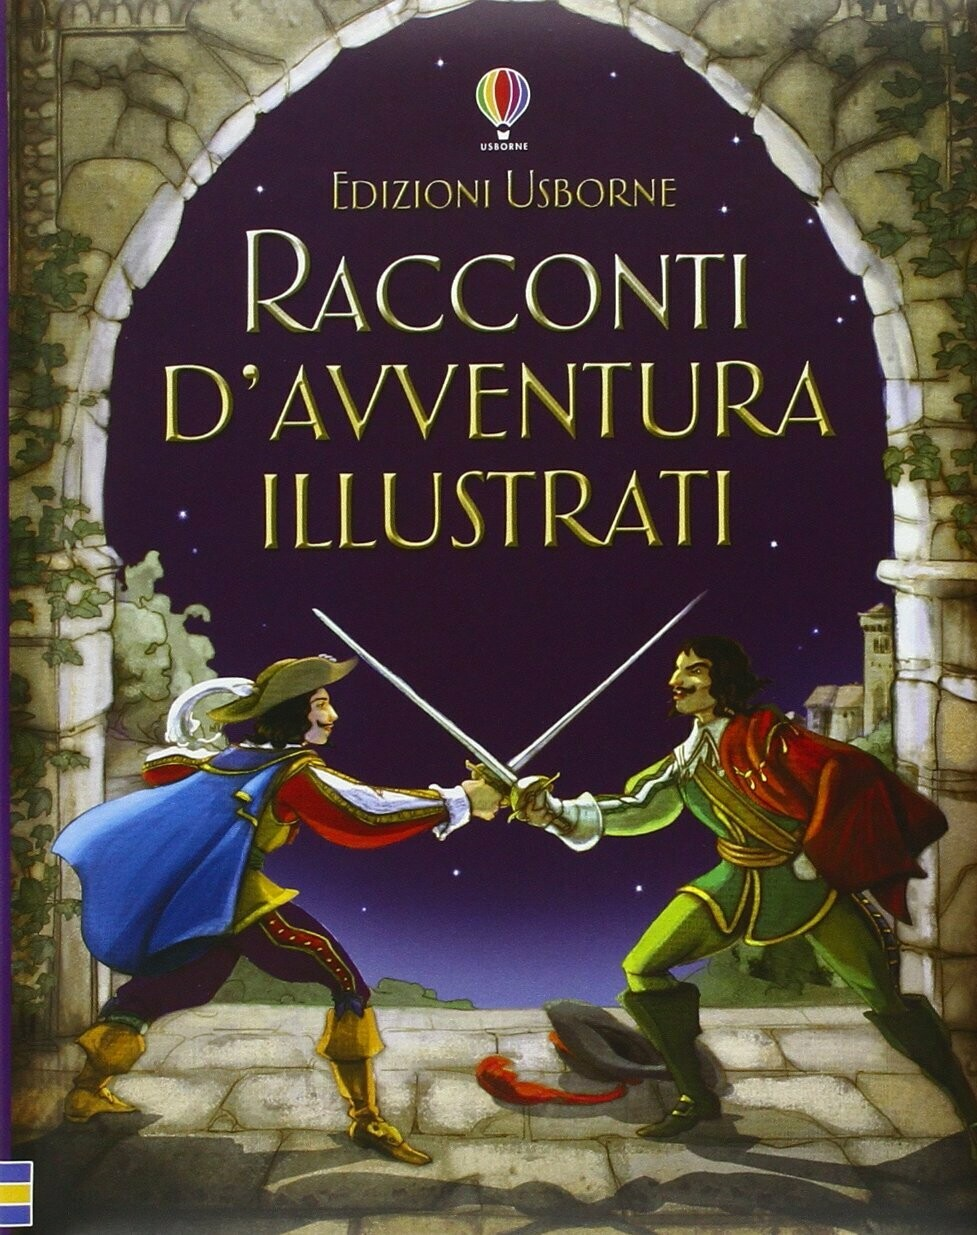 Racconti d'avventura illustrati